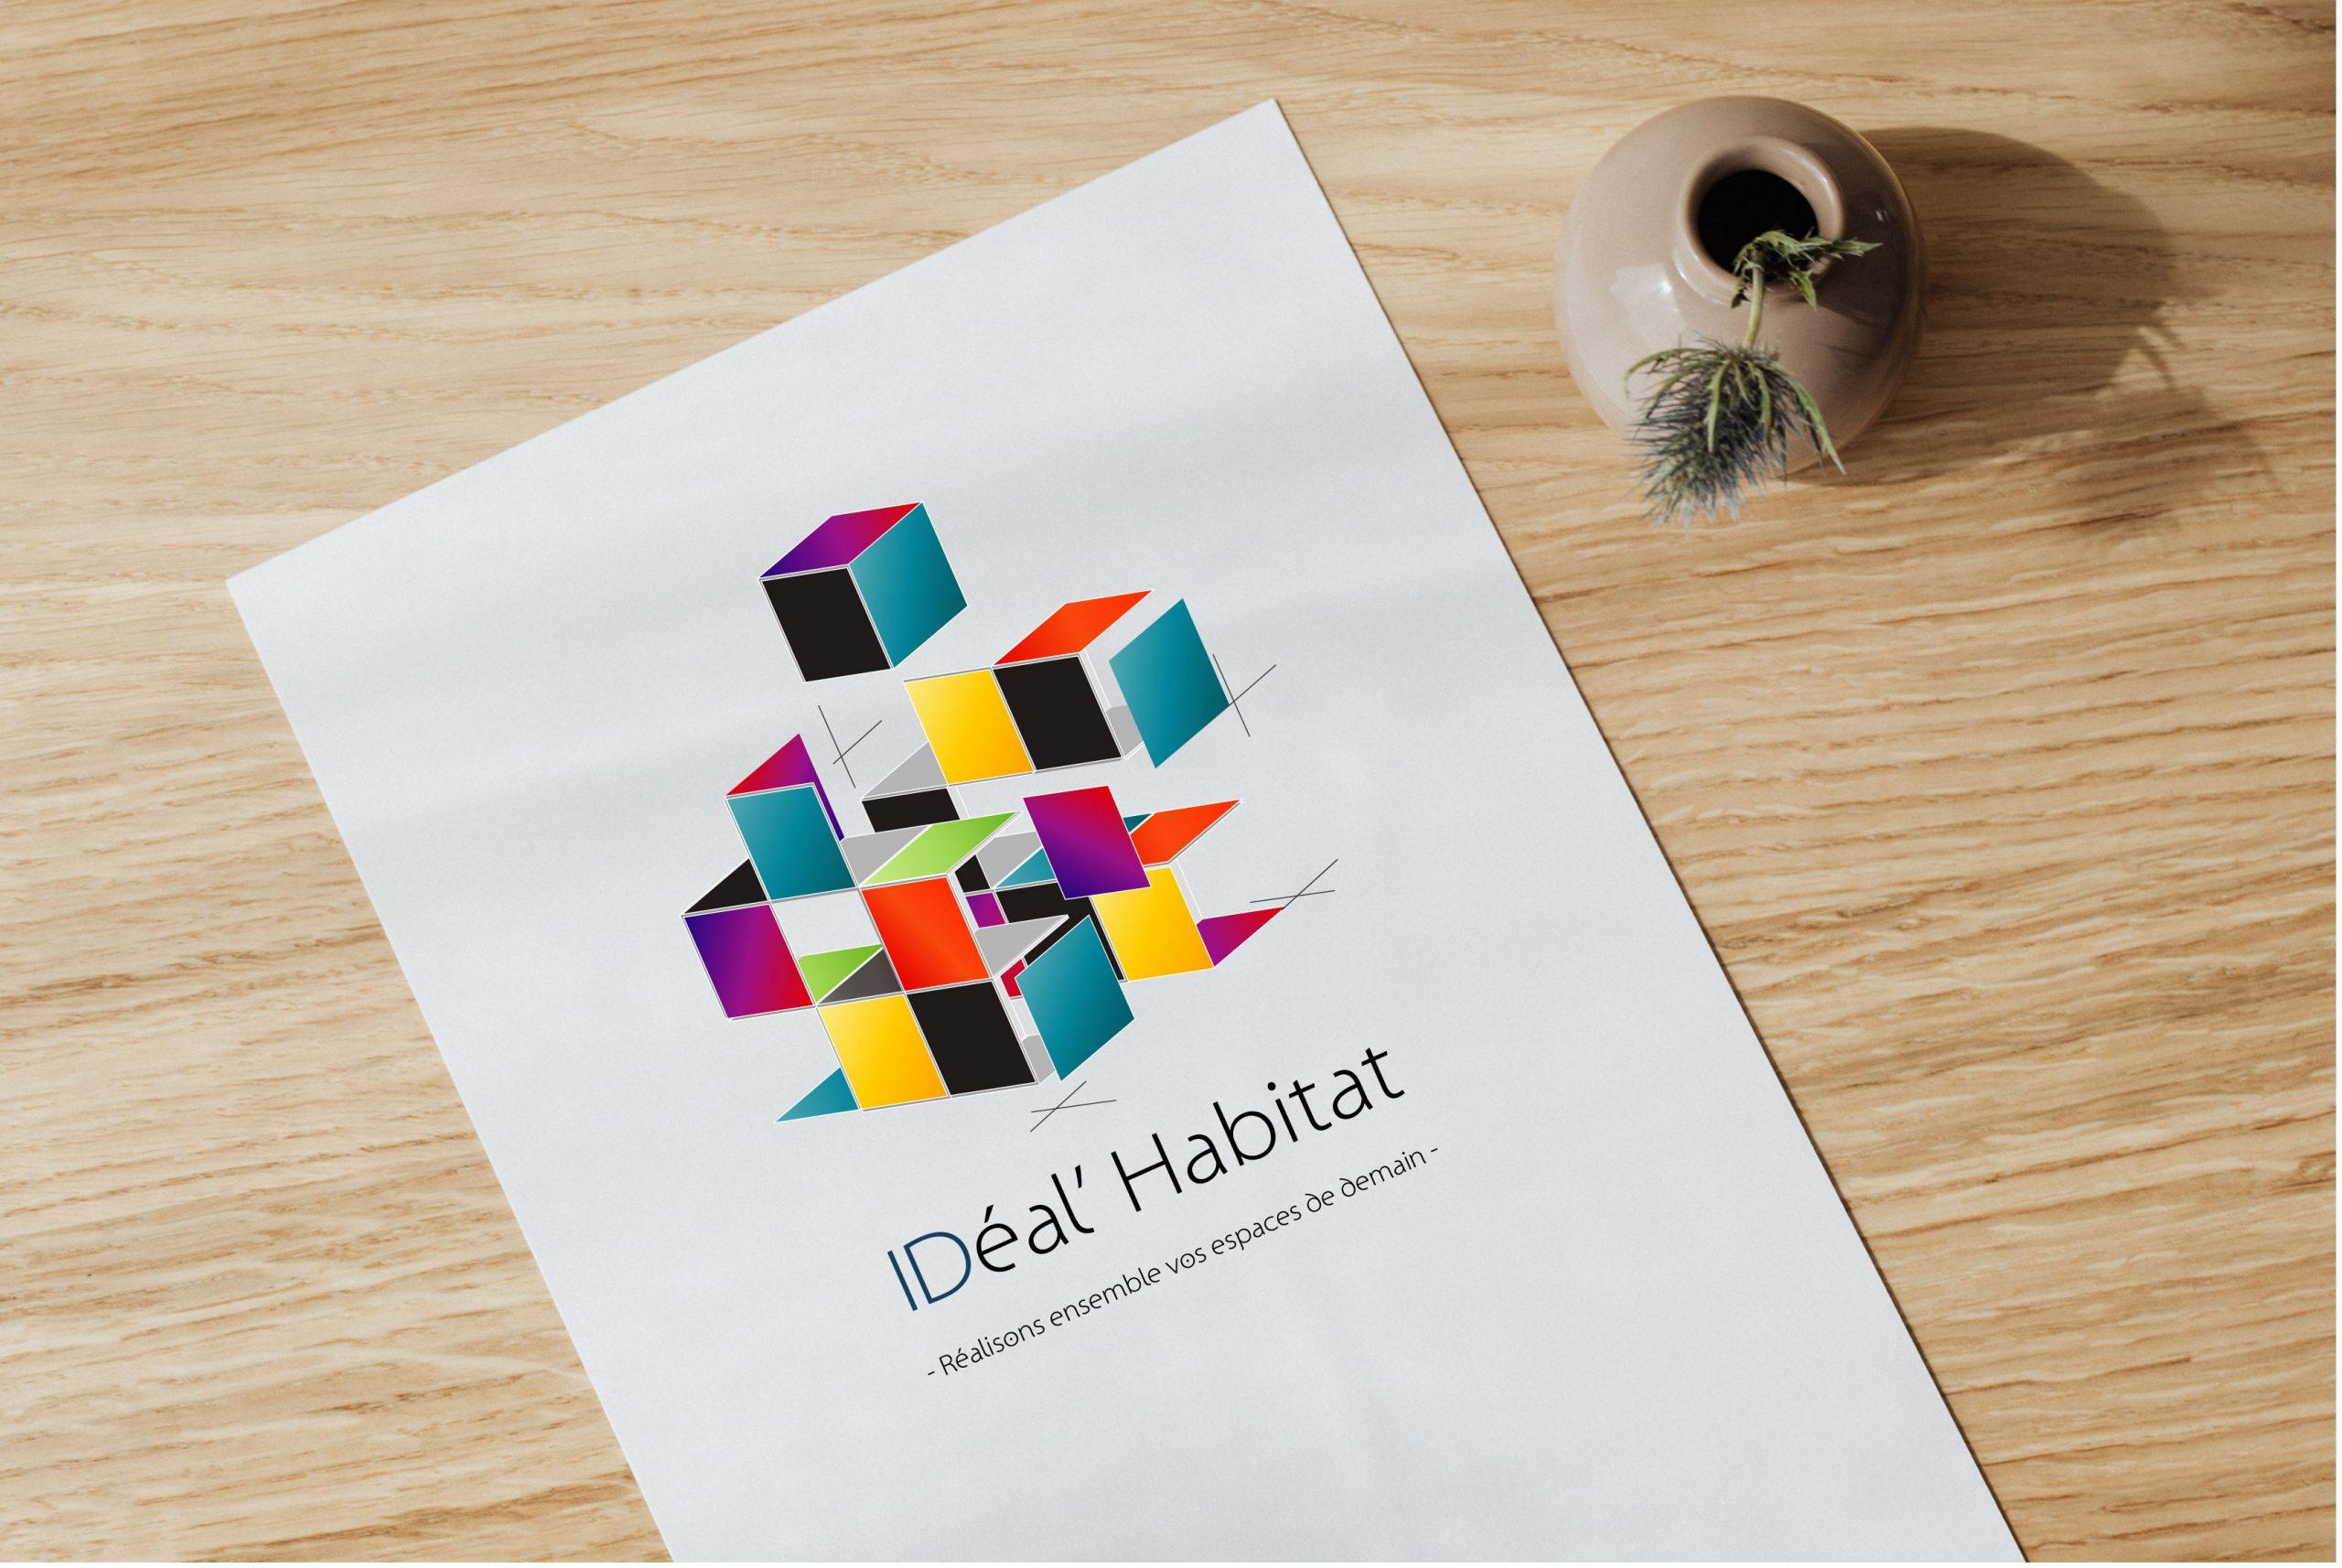 création du logo ideal habitat